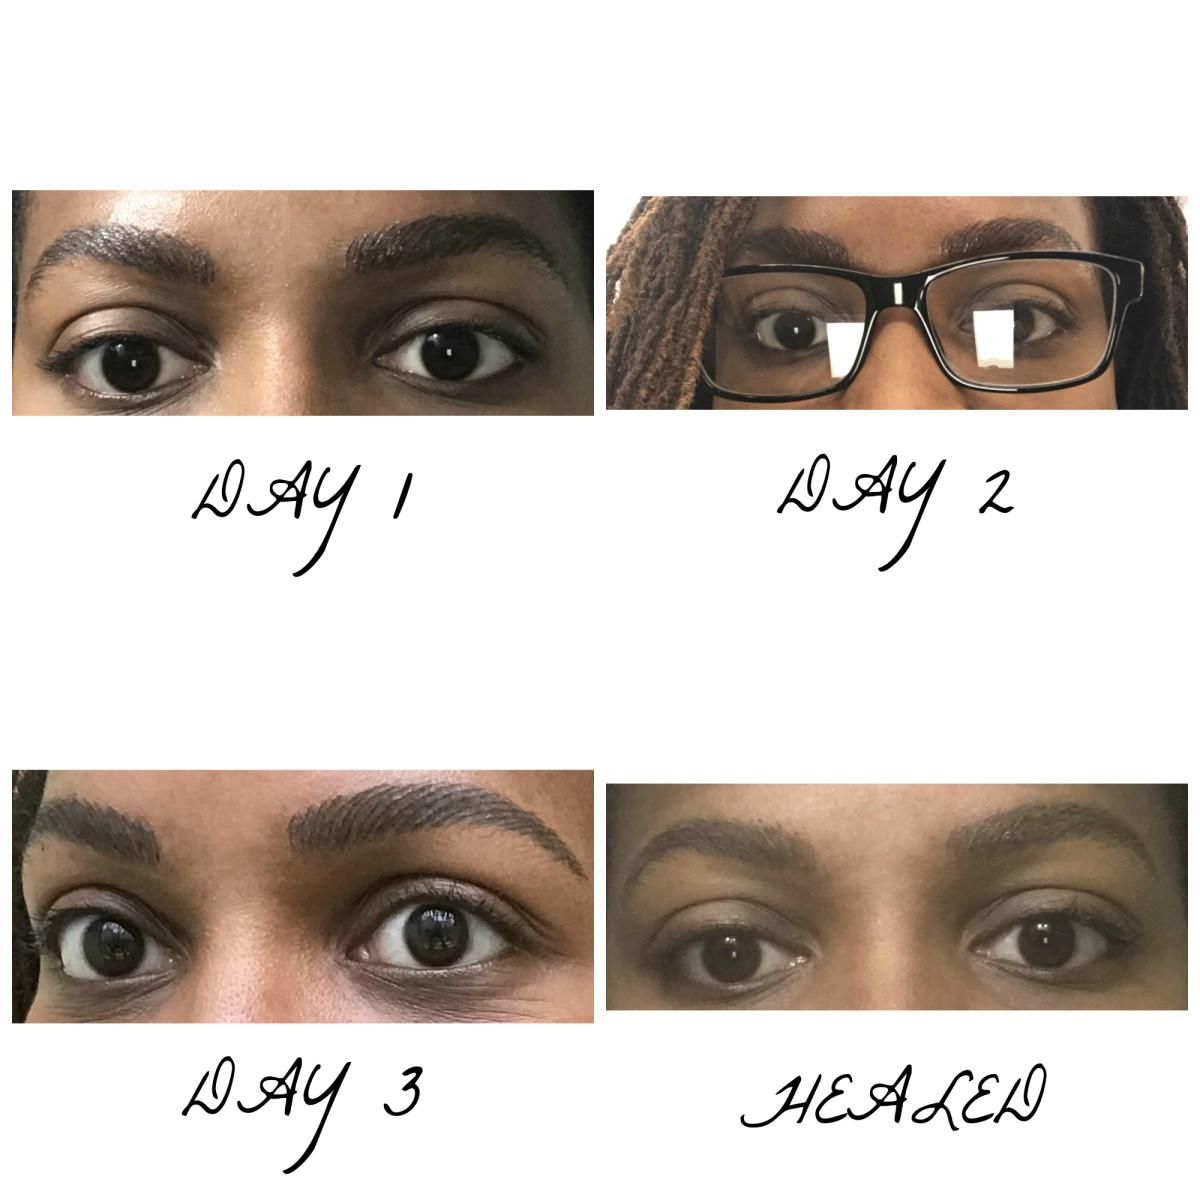 eyebrow-microblading-natural-looking-permanent-makeup